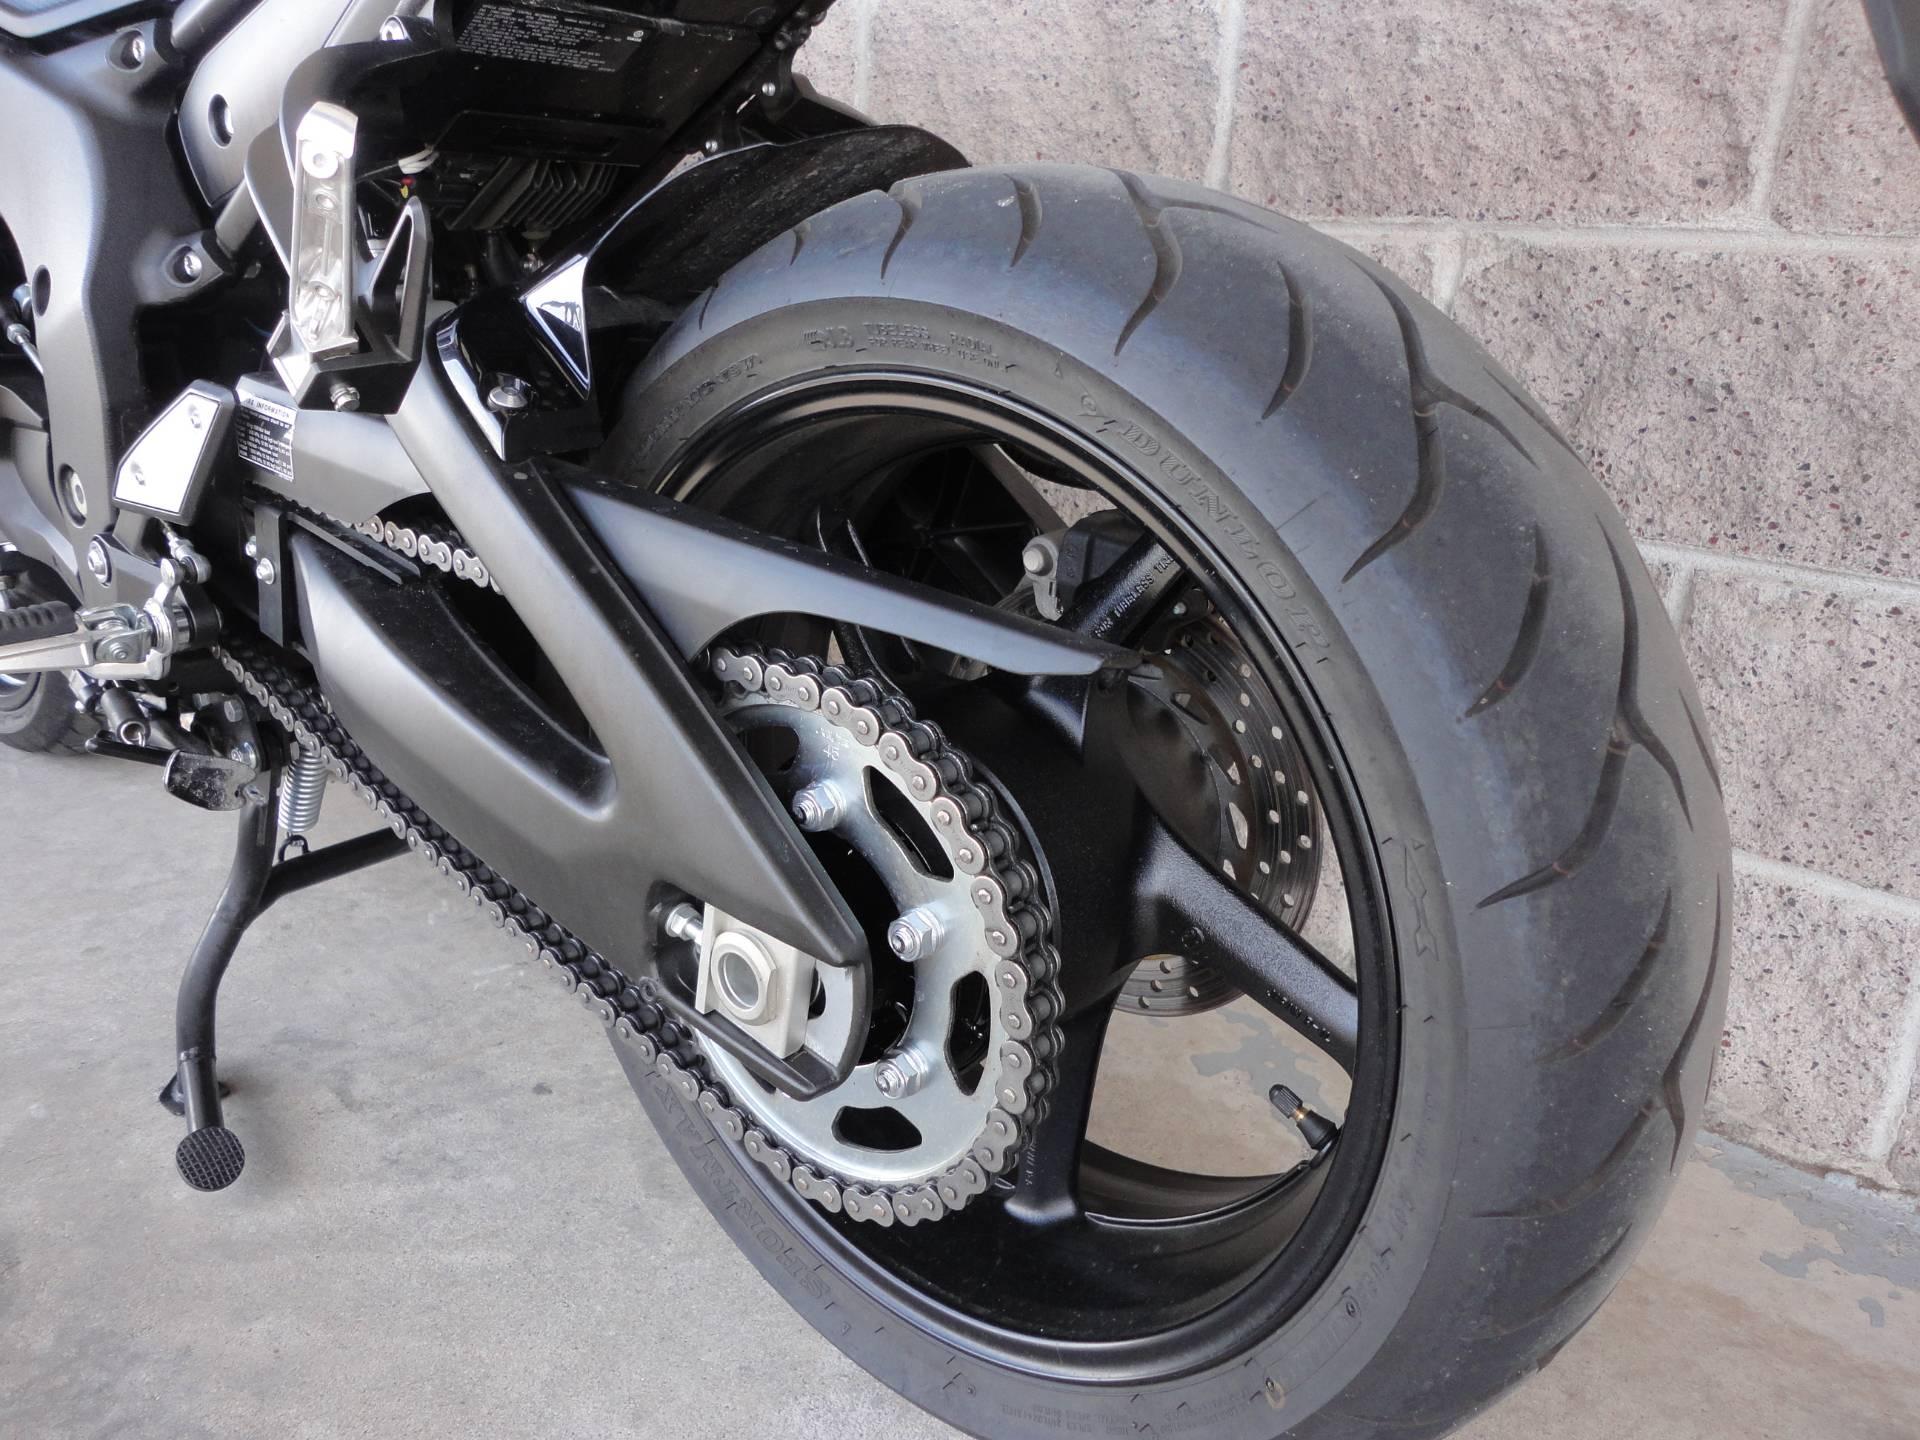 2013 Yamaha FZ1 in Denver, Colorado